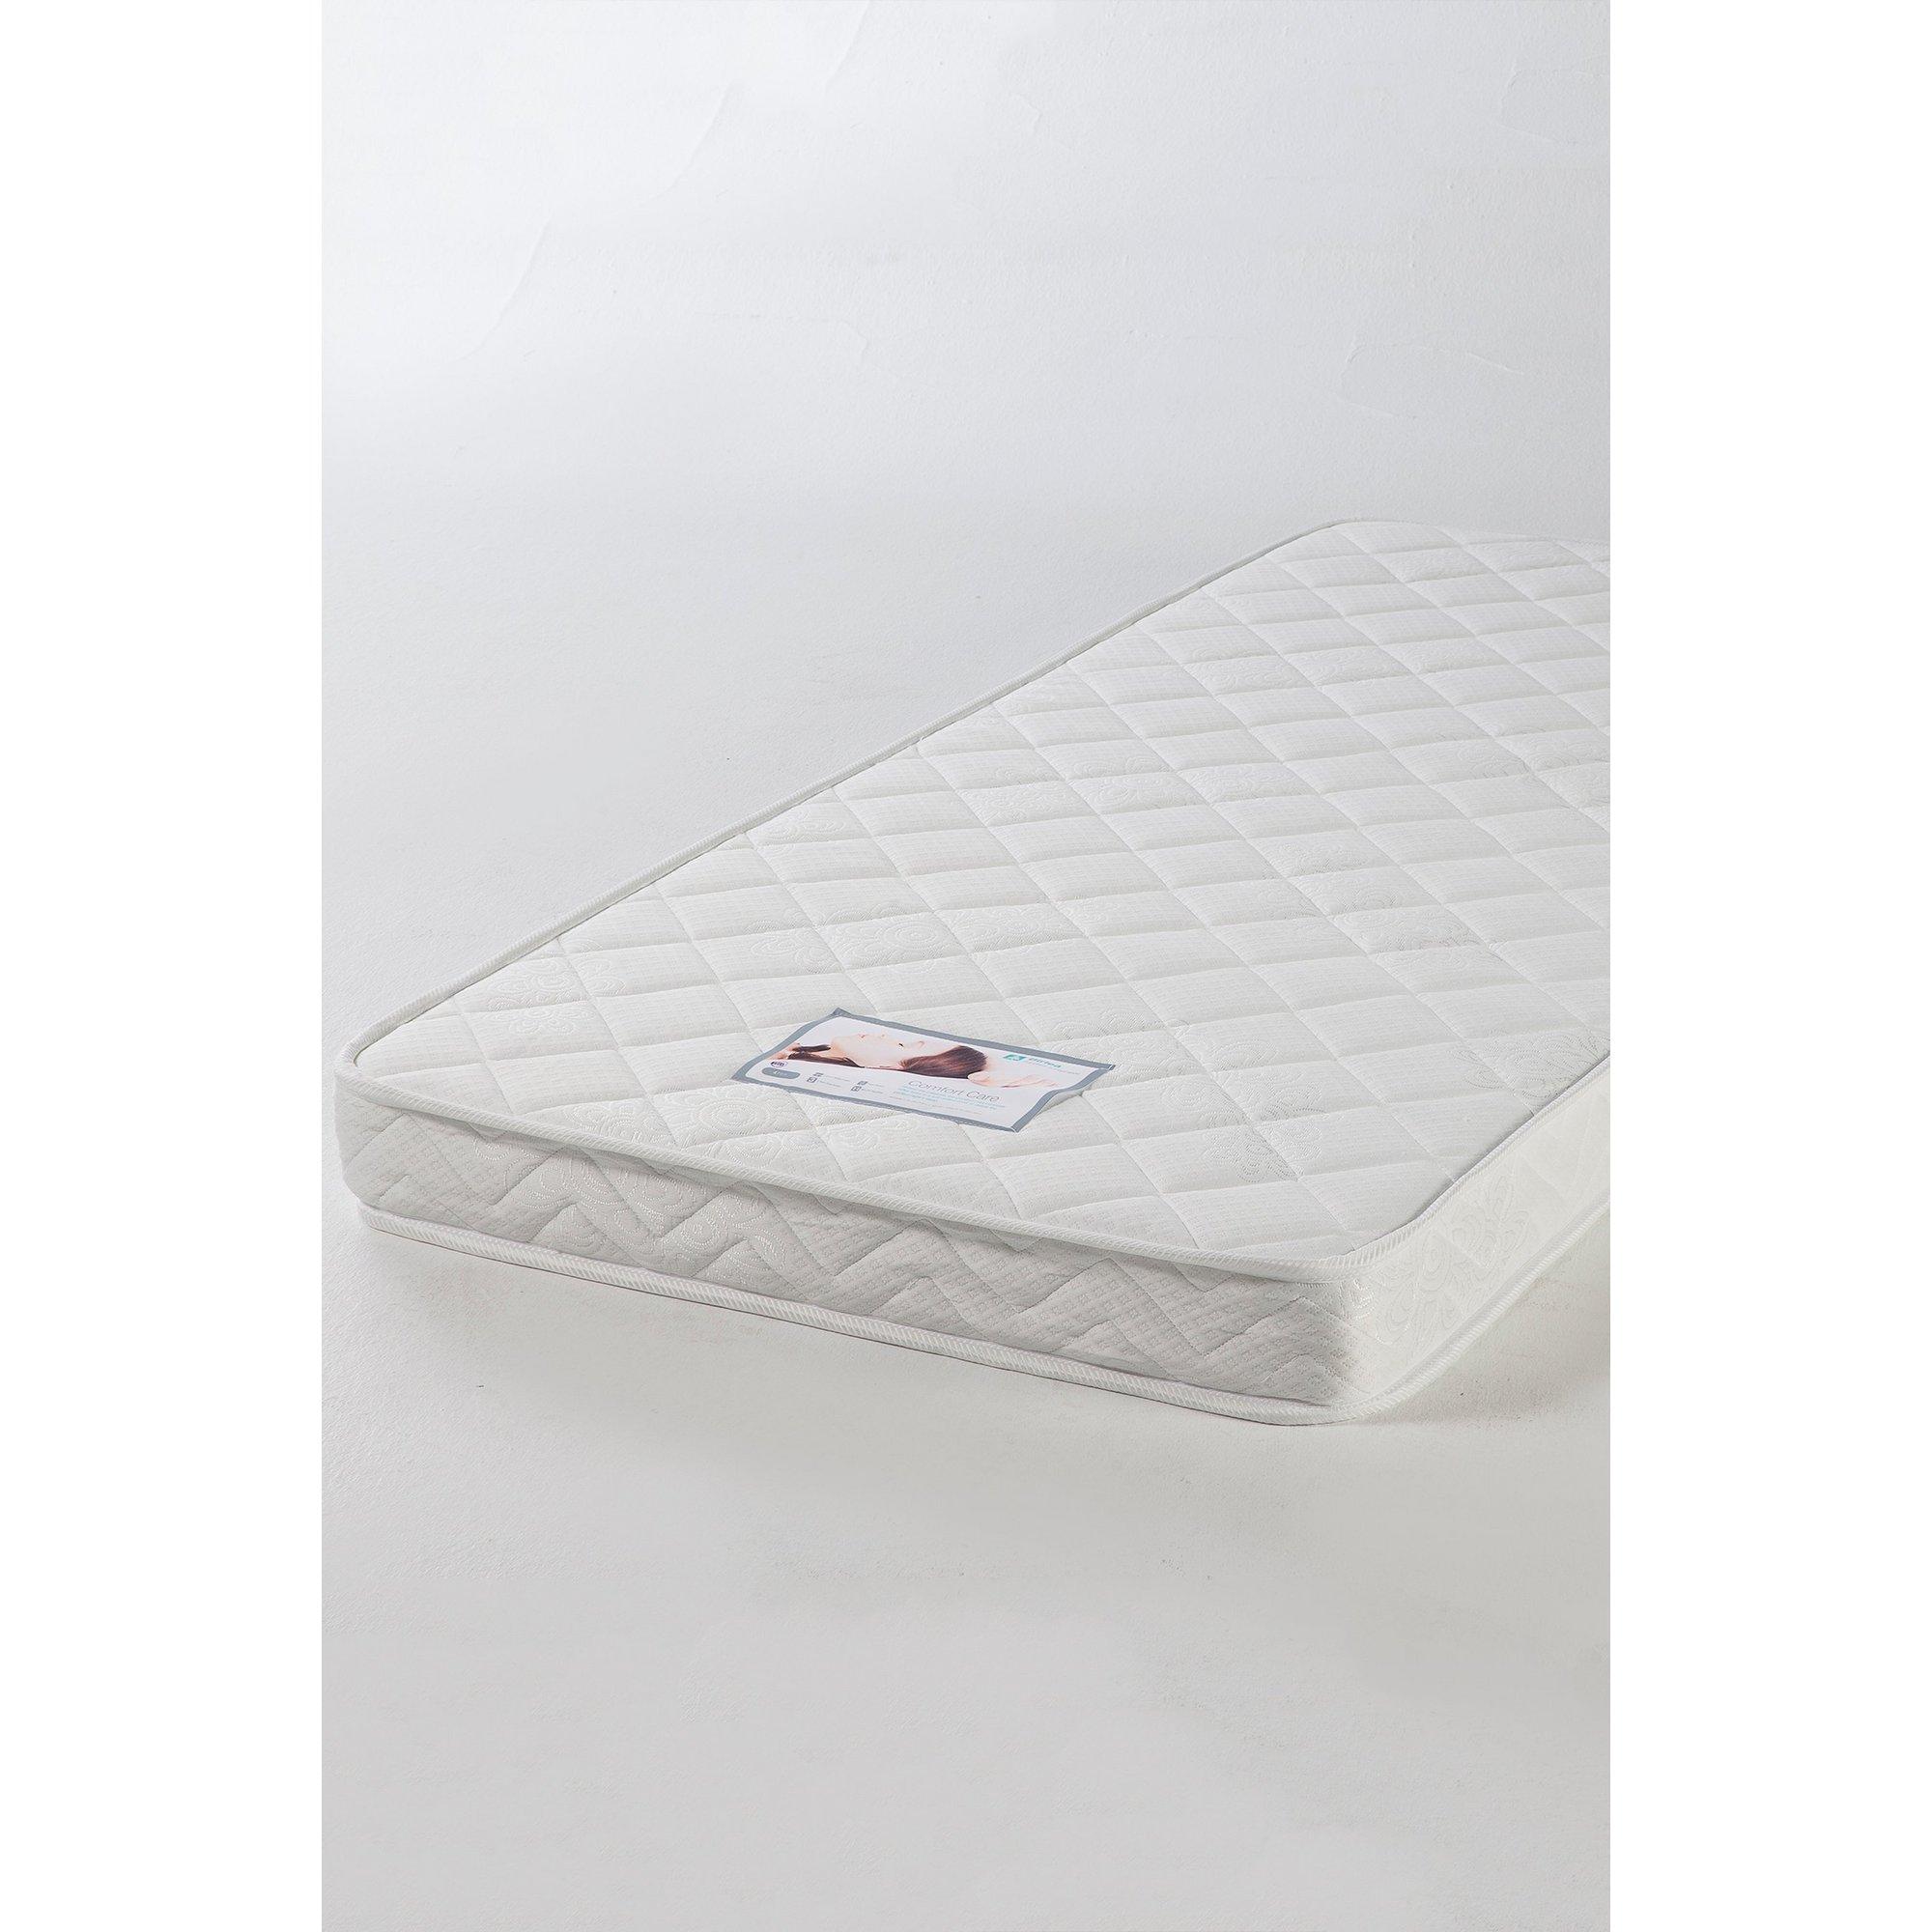 Image of Comfort Care Mattress